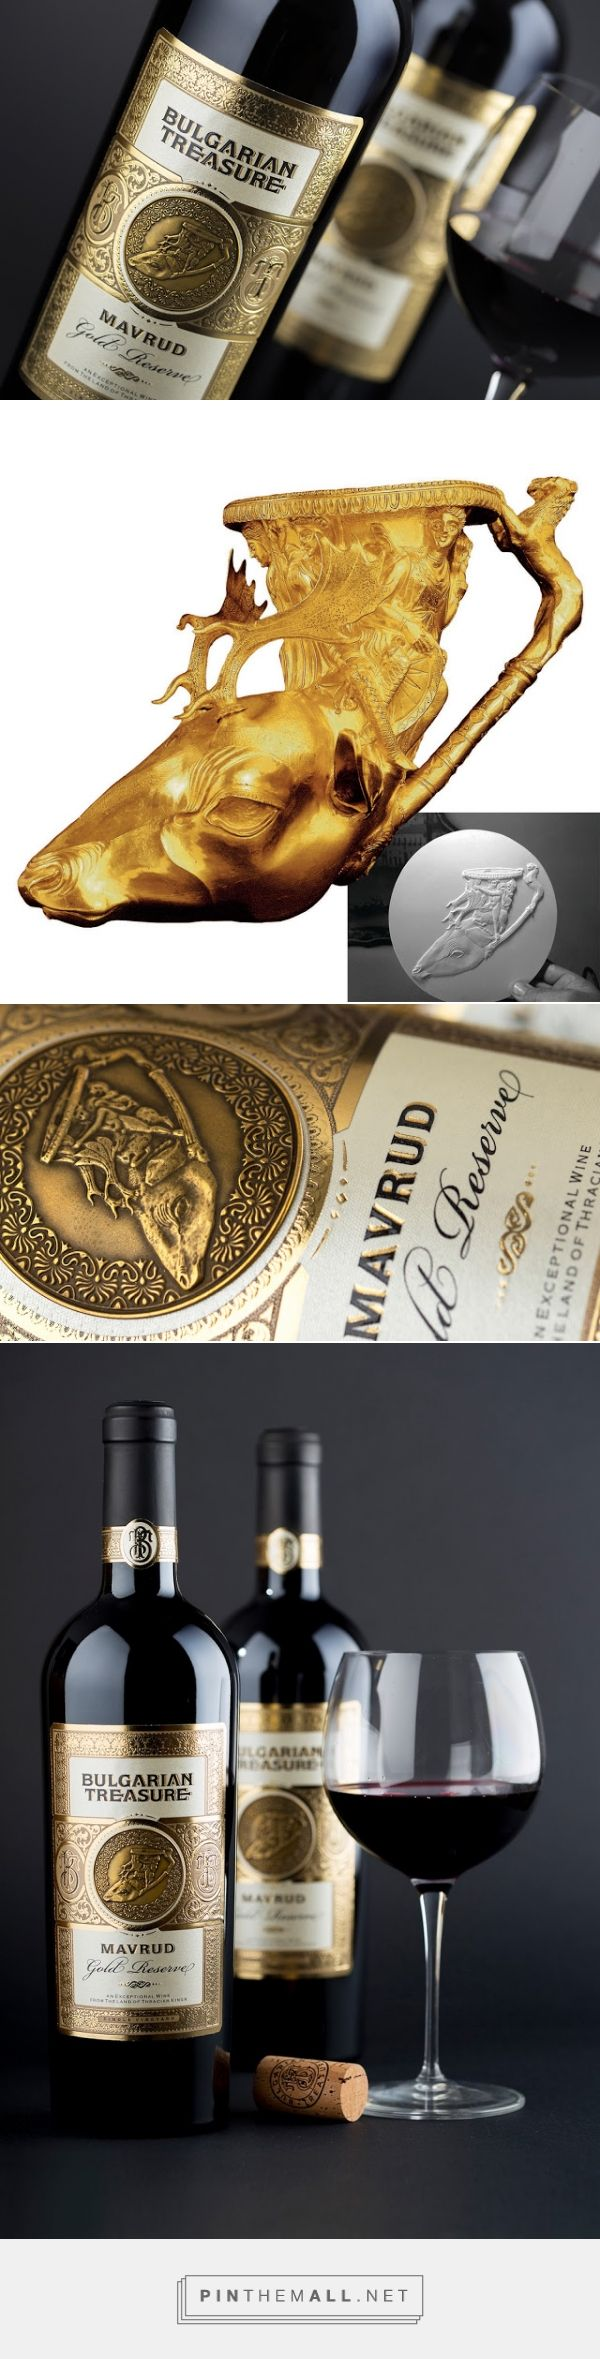 The Bulgarian Treasure Wine label designed by The Labelmaker - http://www.packagingoftheworld.com/2015/12/the-bulgarian-treasure-wine.html - created via https://pinthemall.net